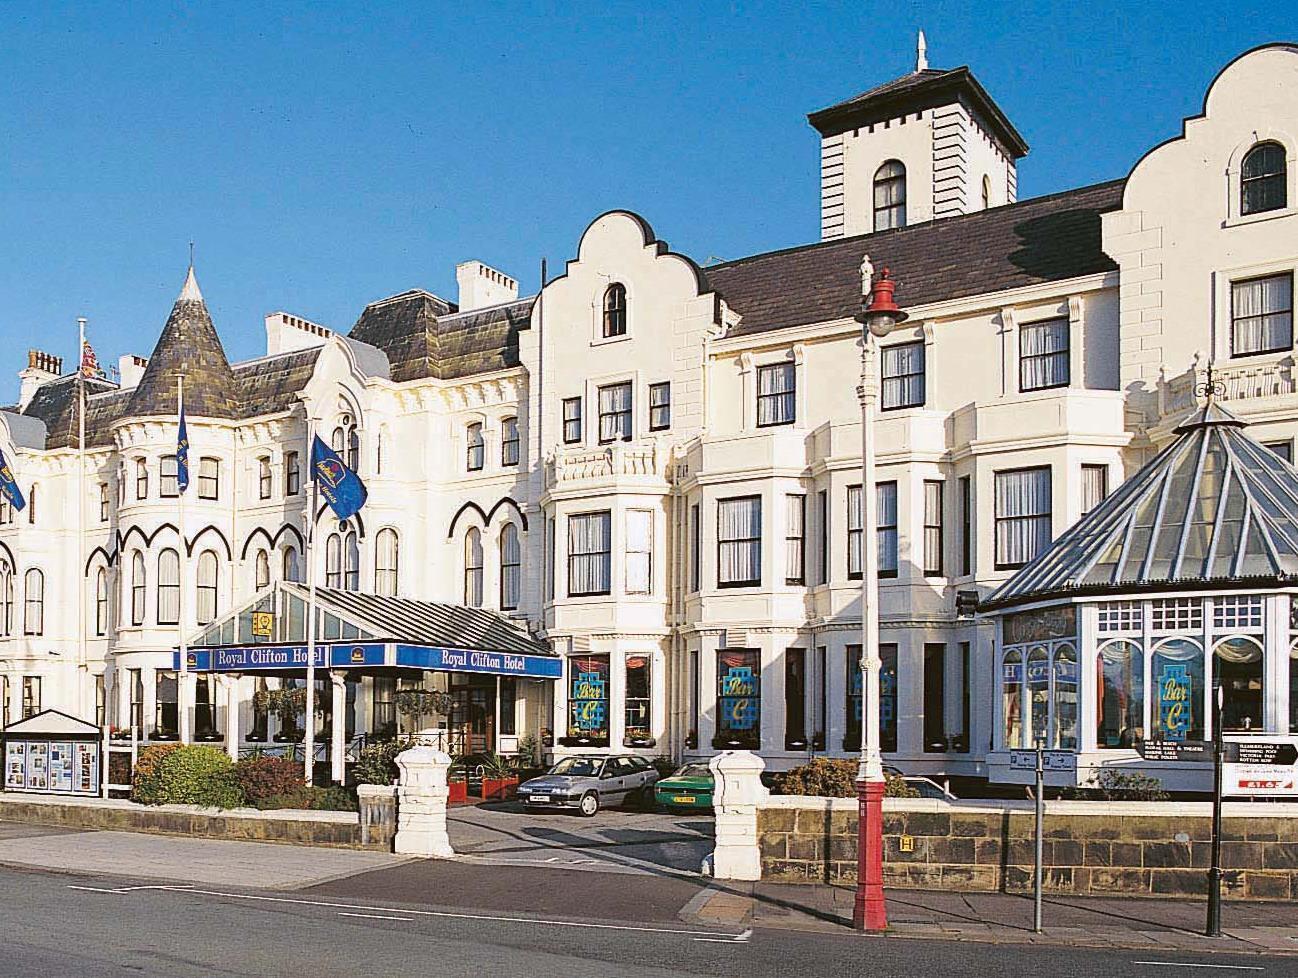 Royal Clifton Hotel And Spa